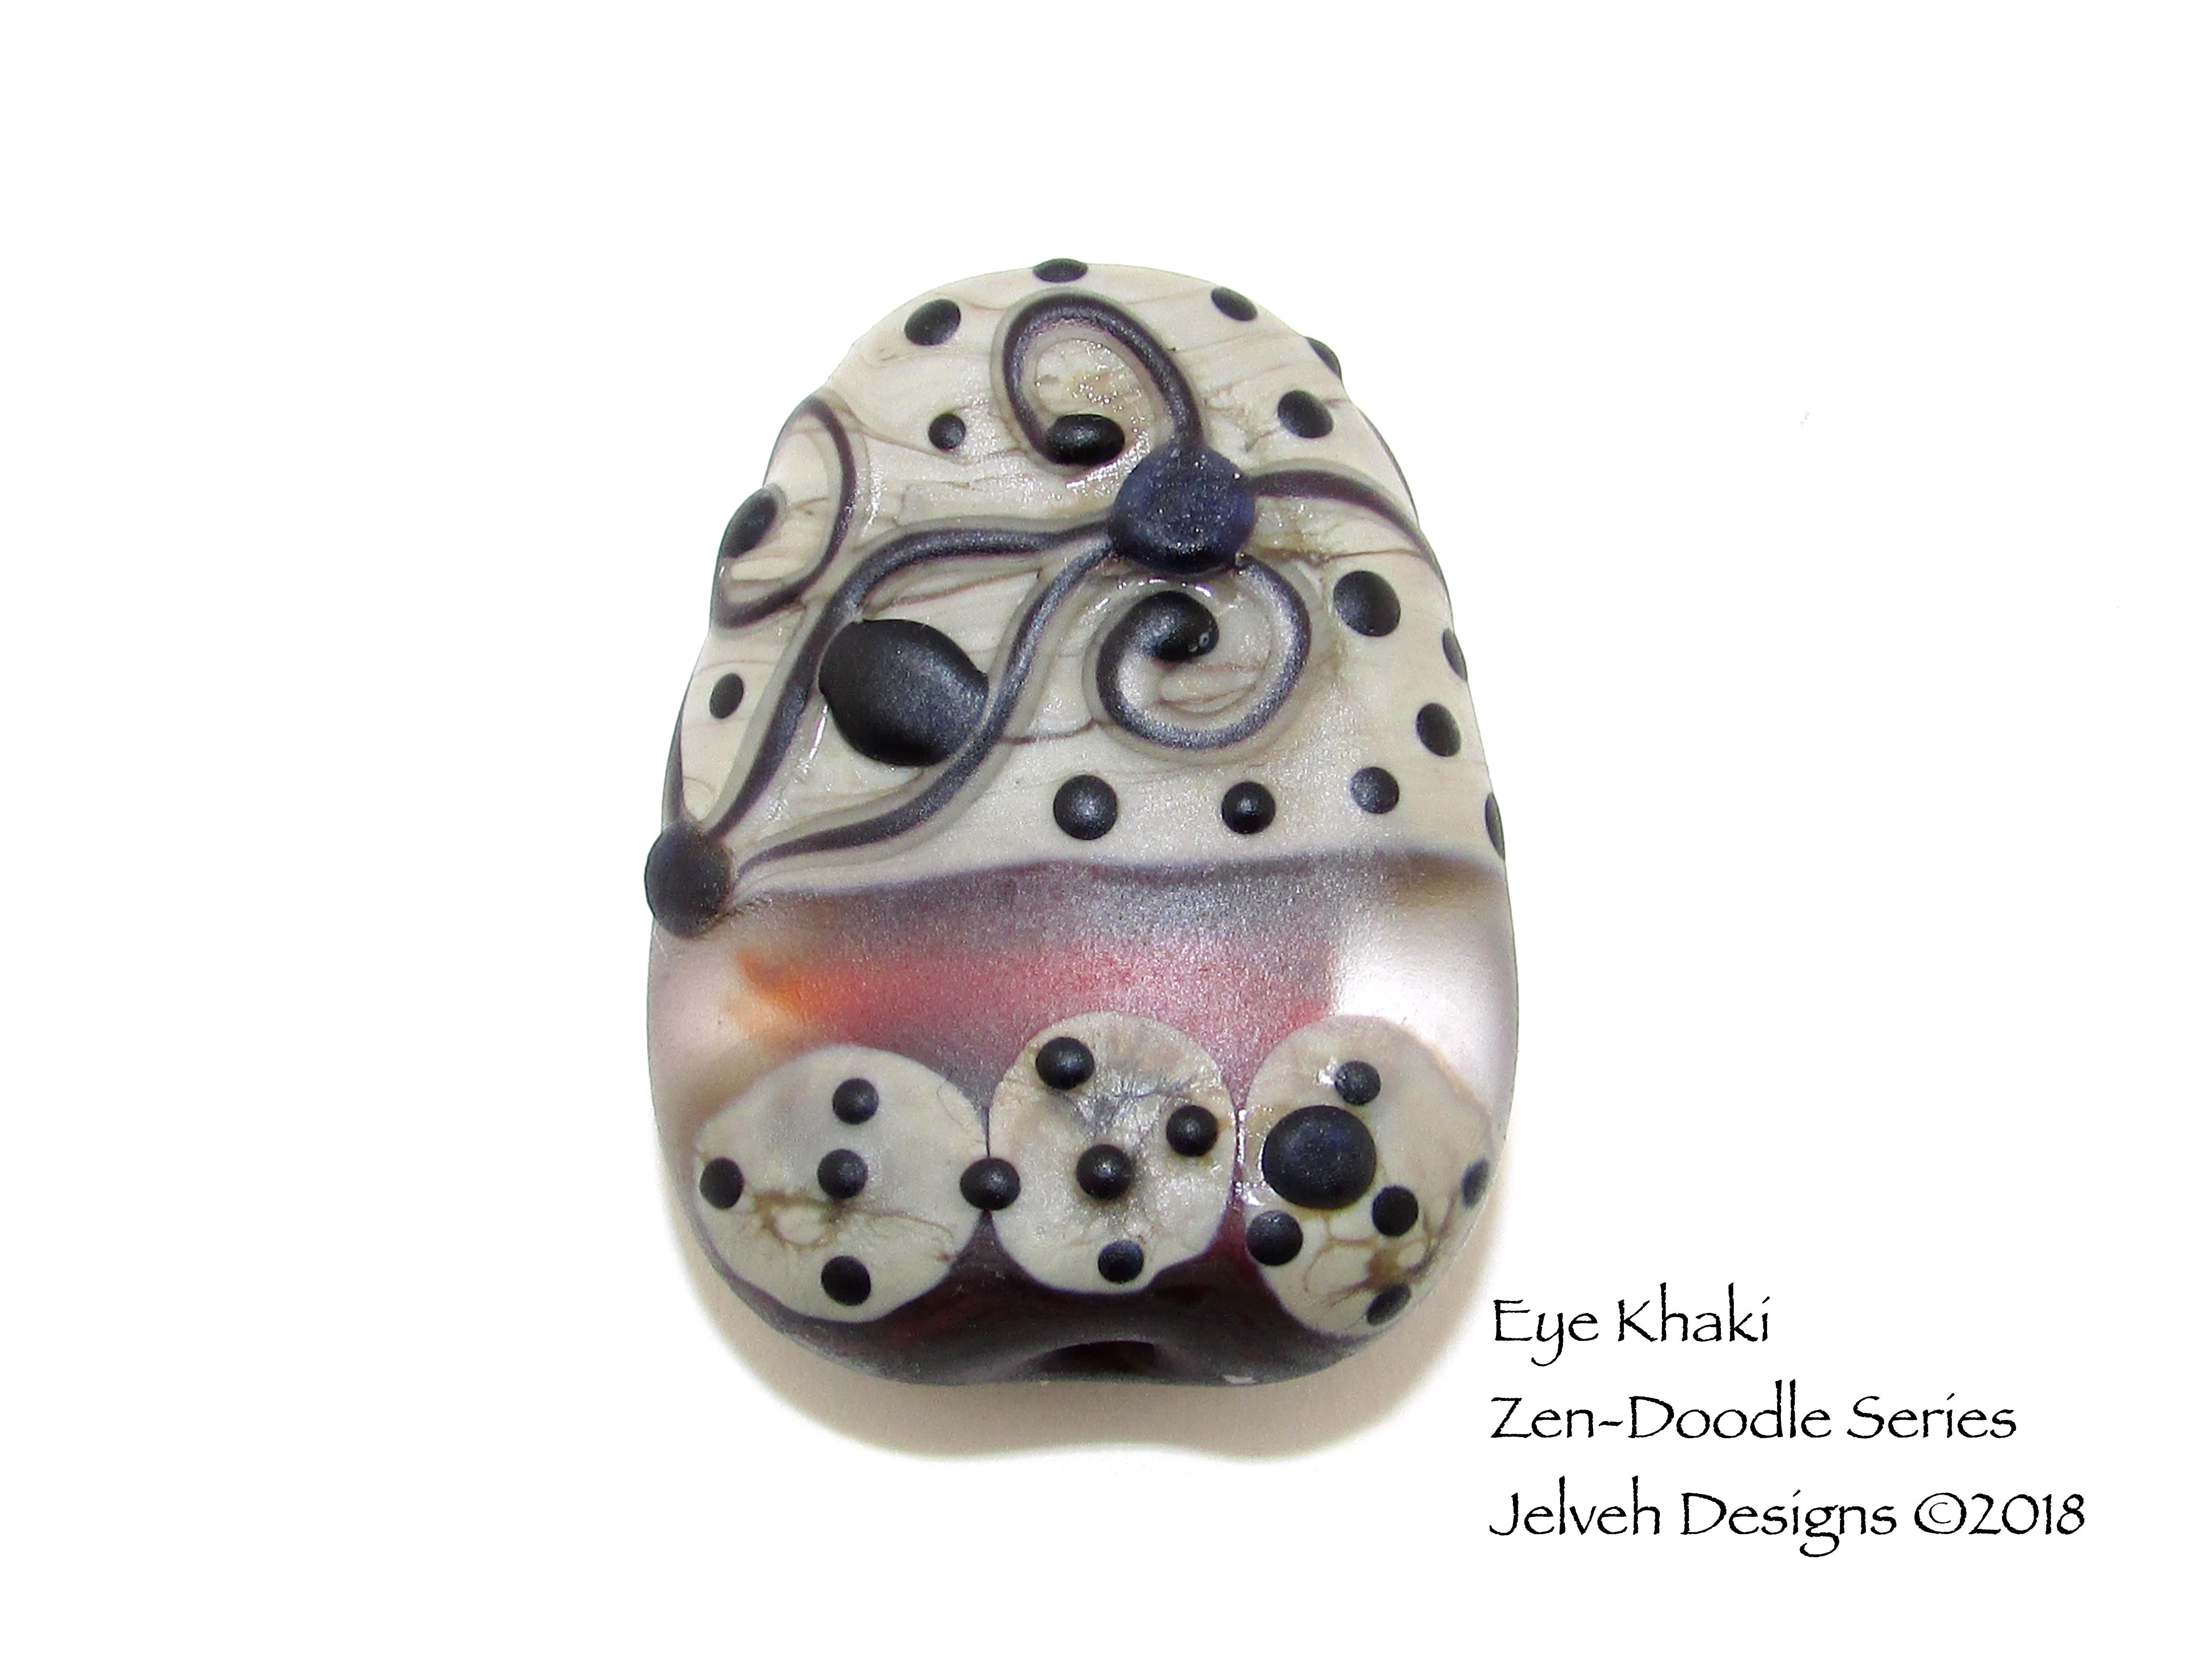 eyekhaki